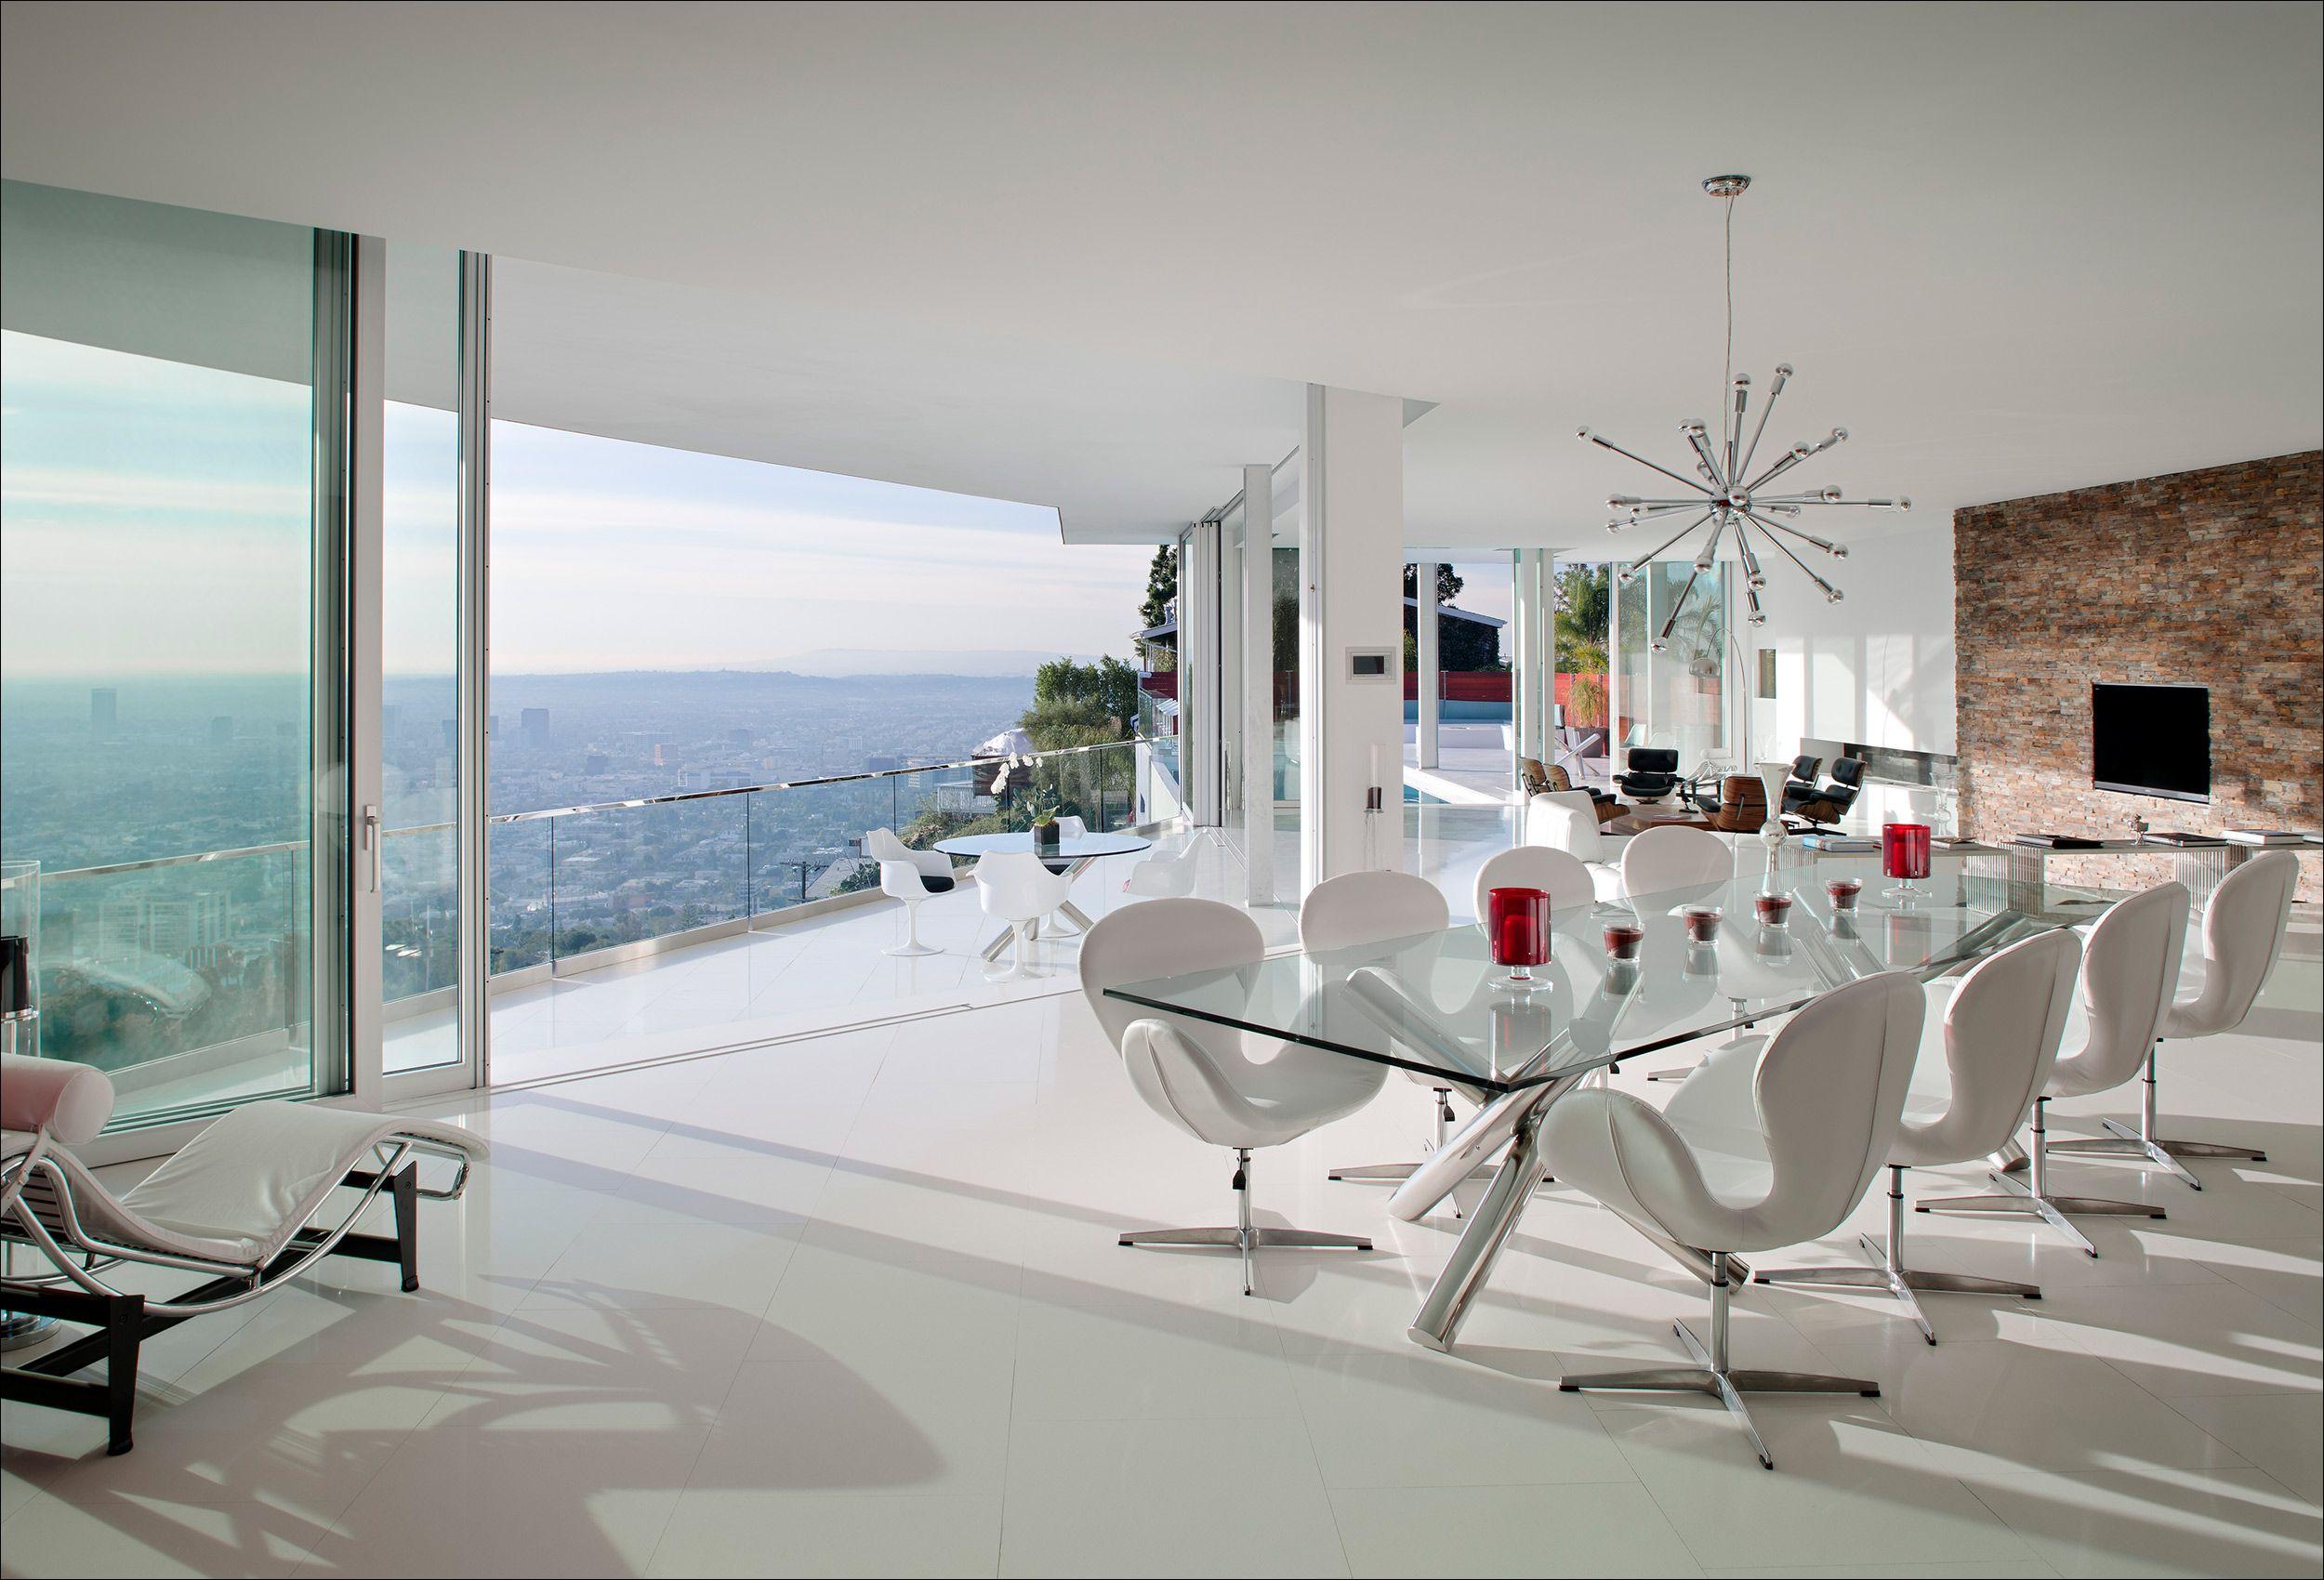 HollywoodHills_InteriorDesign_Modern_Photographer.jpg